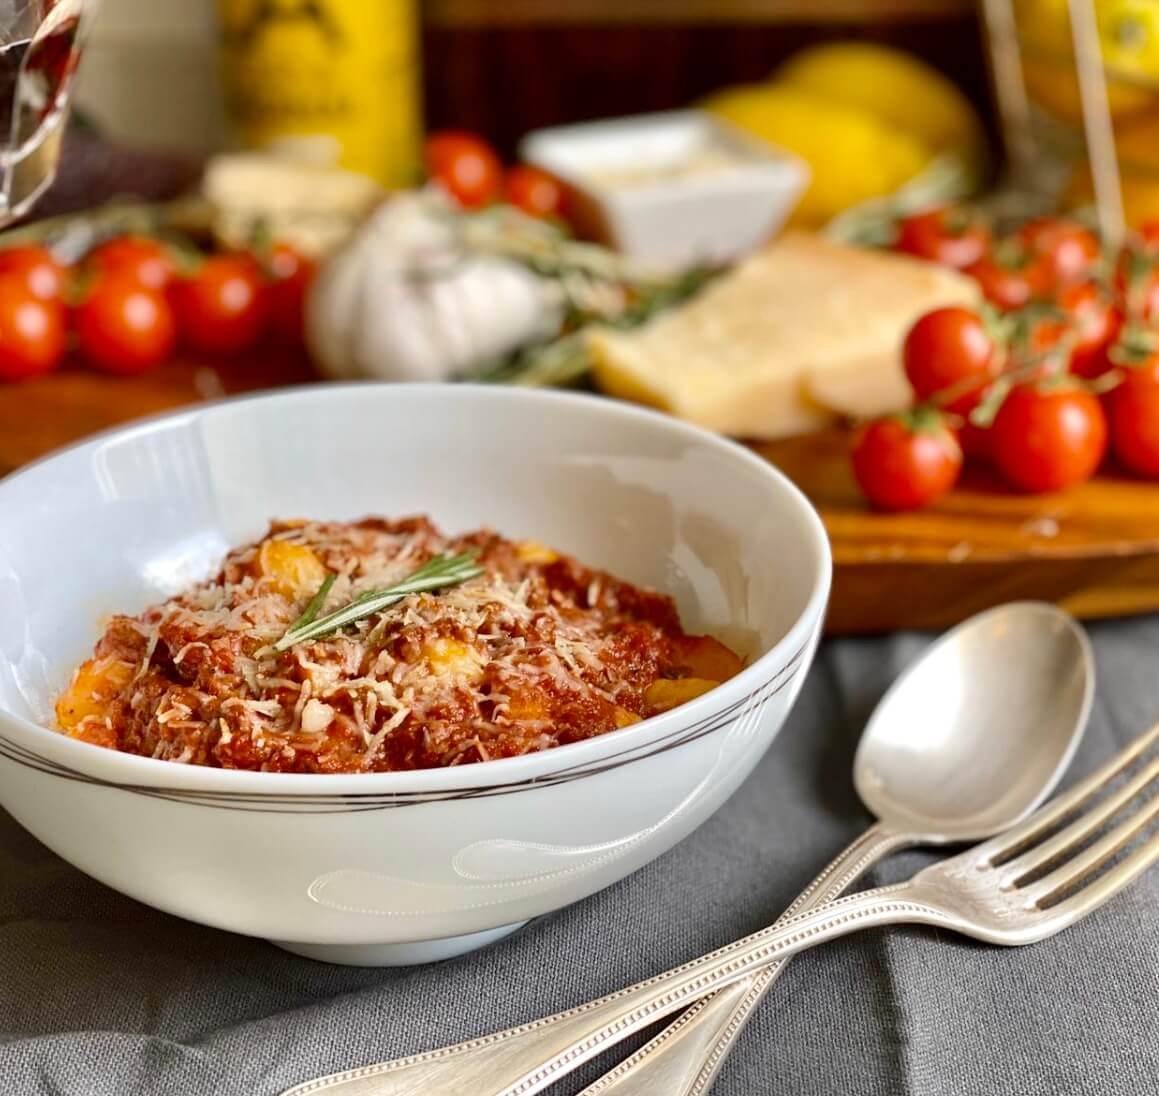 Bowlers comida gourmet saludable